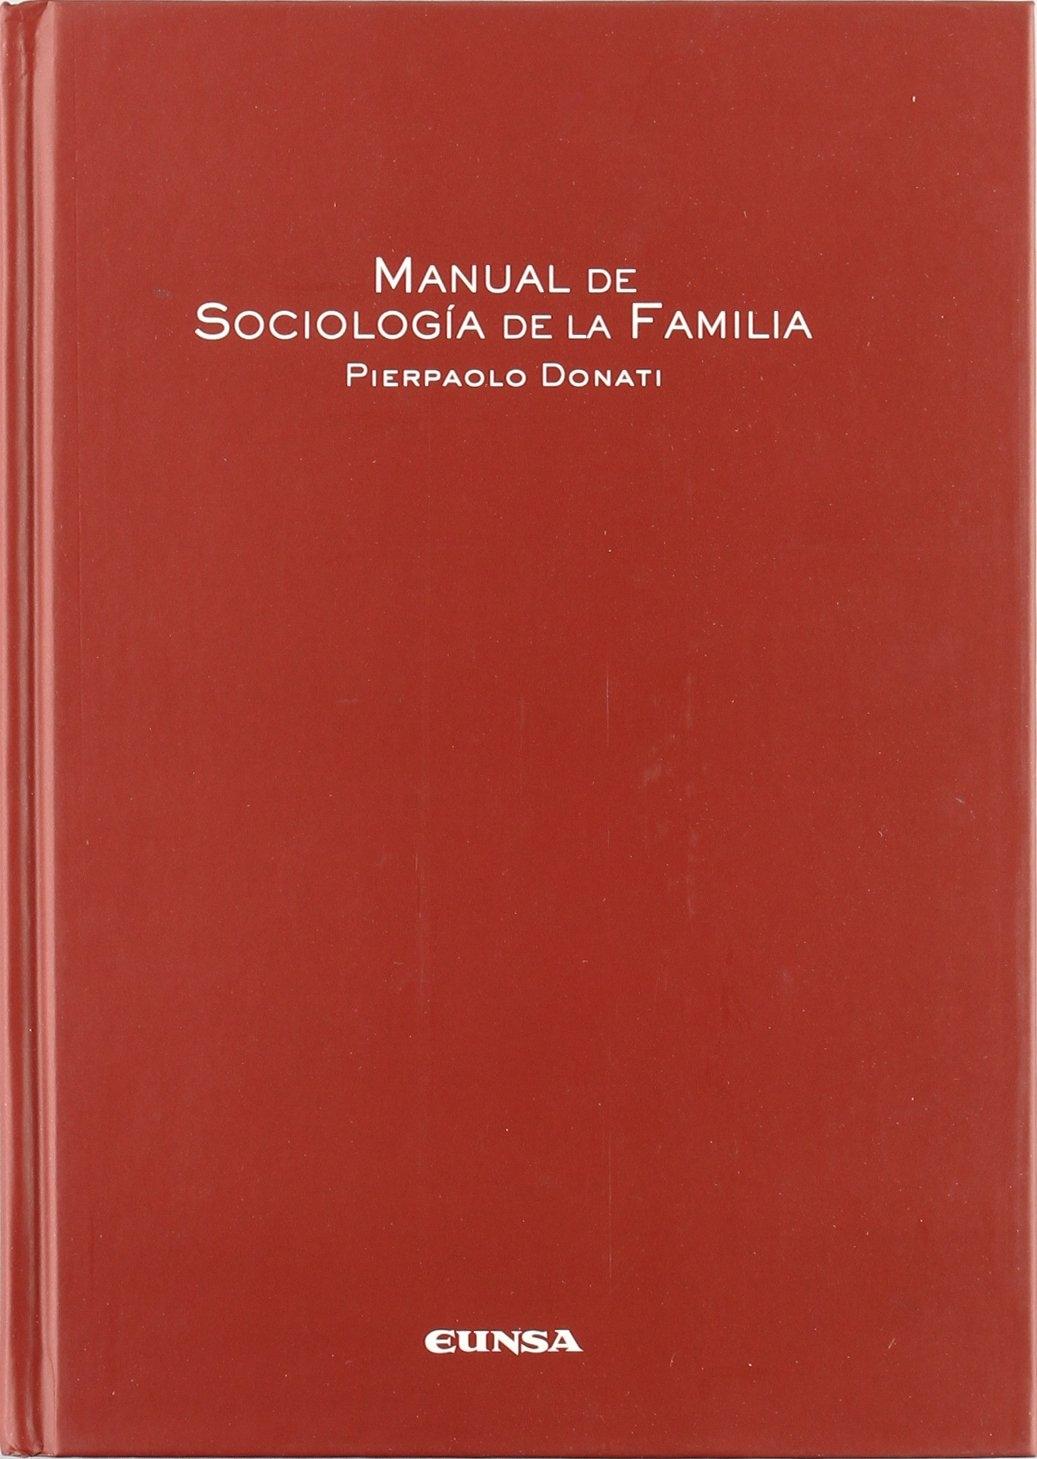 Manual de sociologia de la familia